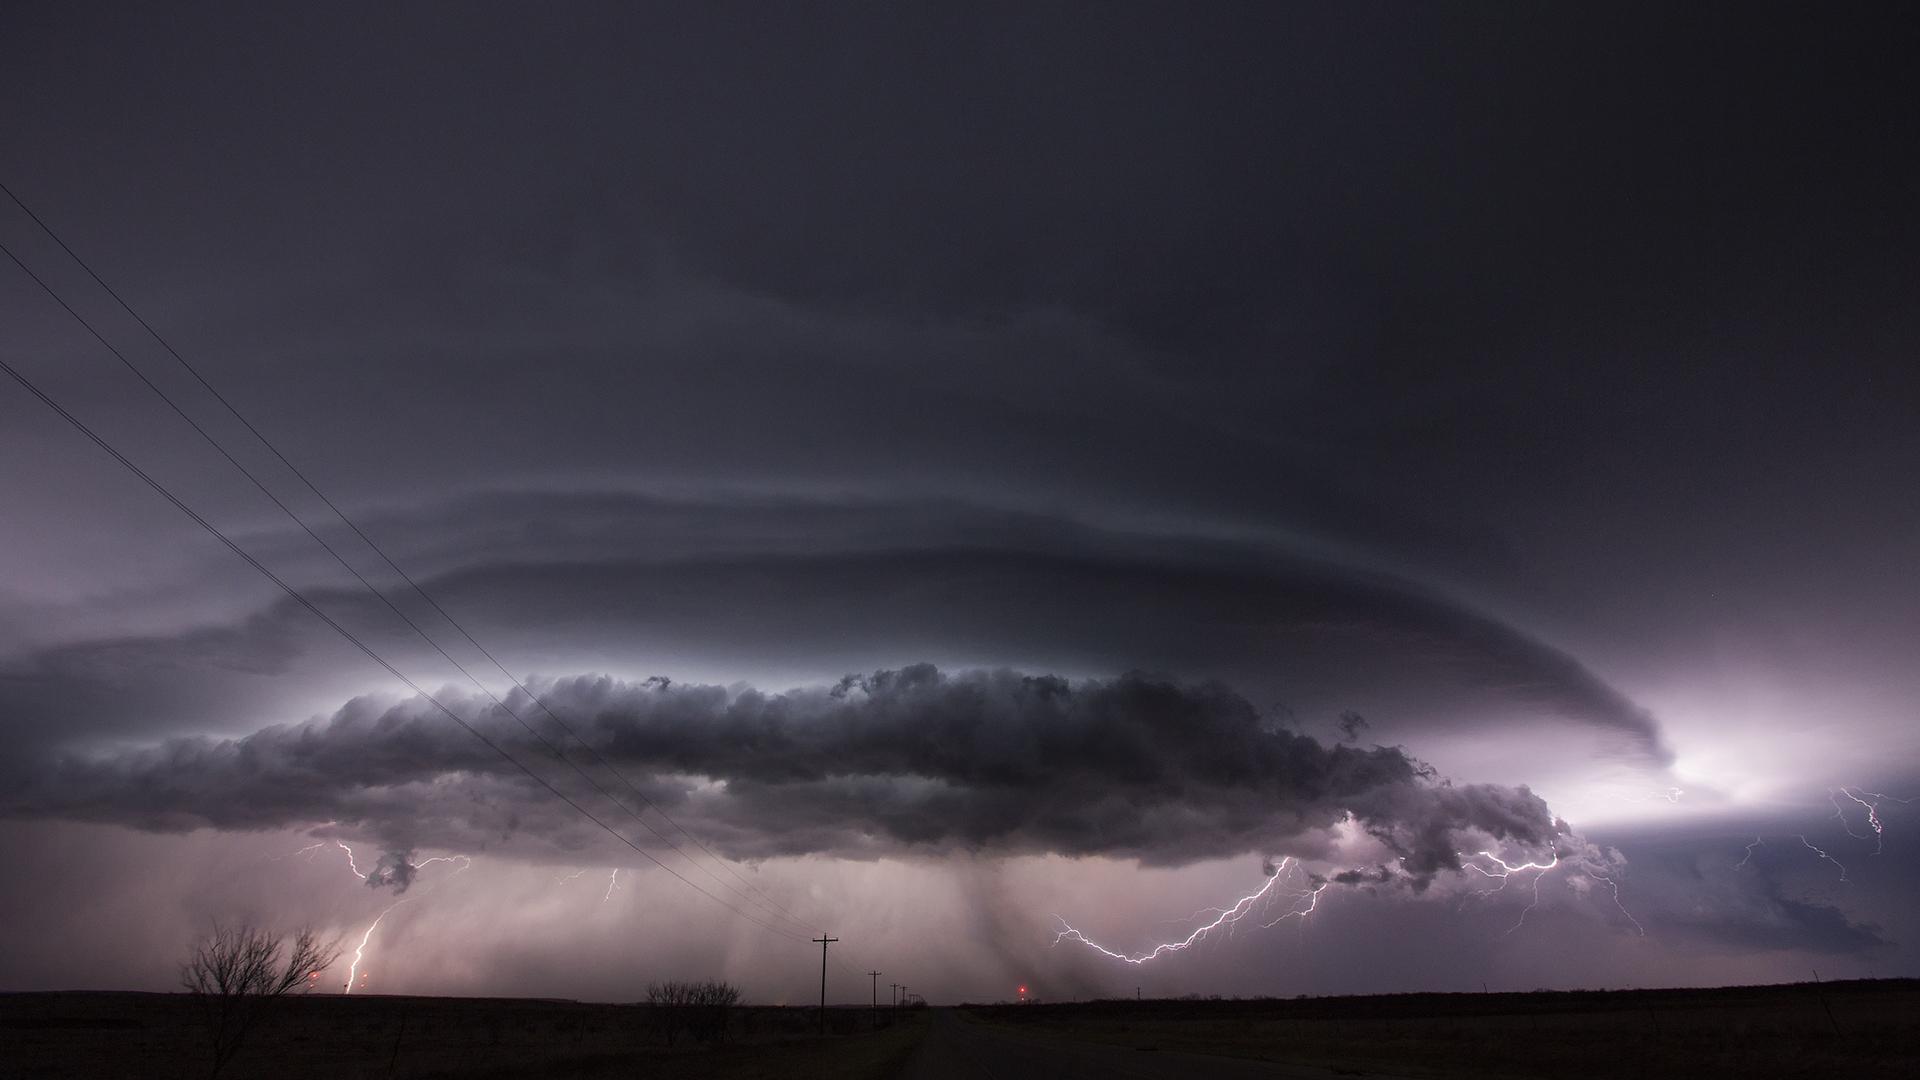 Hd Irish Wallpaper Lightning Storm Images Download Free Pixelstalk Net